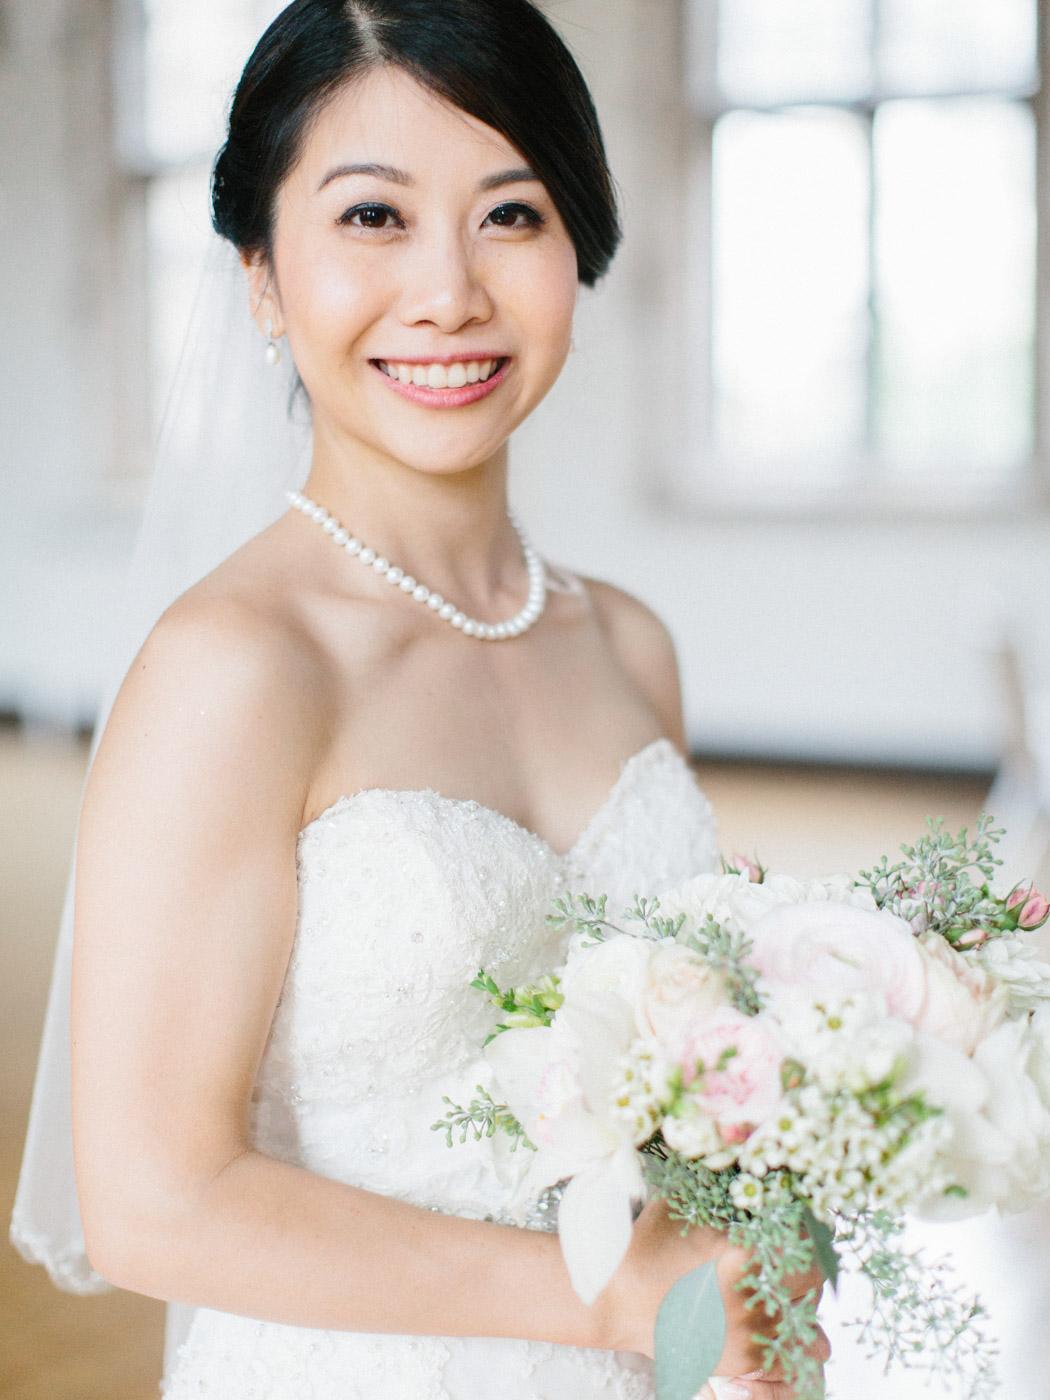 toronto_wedding_photographer_fine_art_documentary_photography-75.jpg